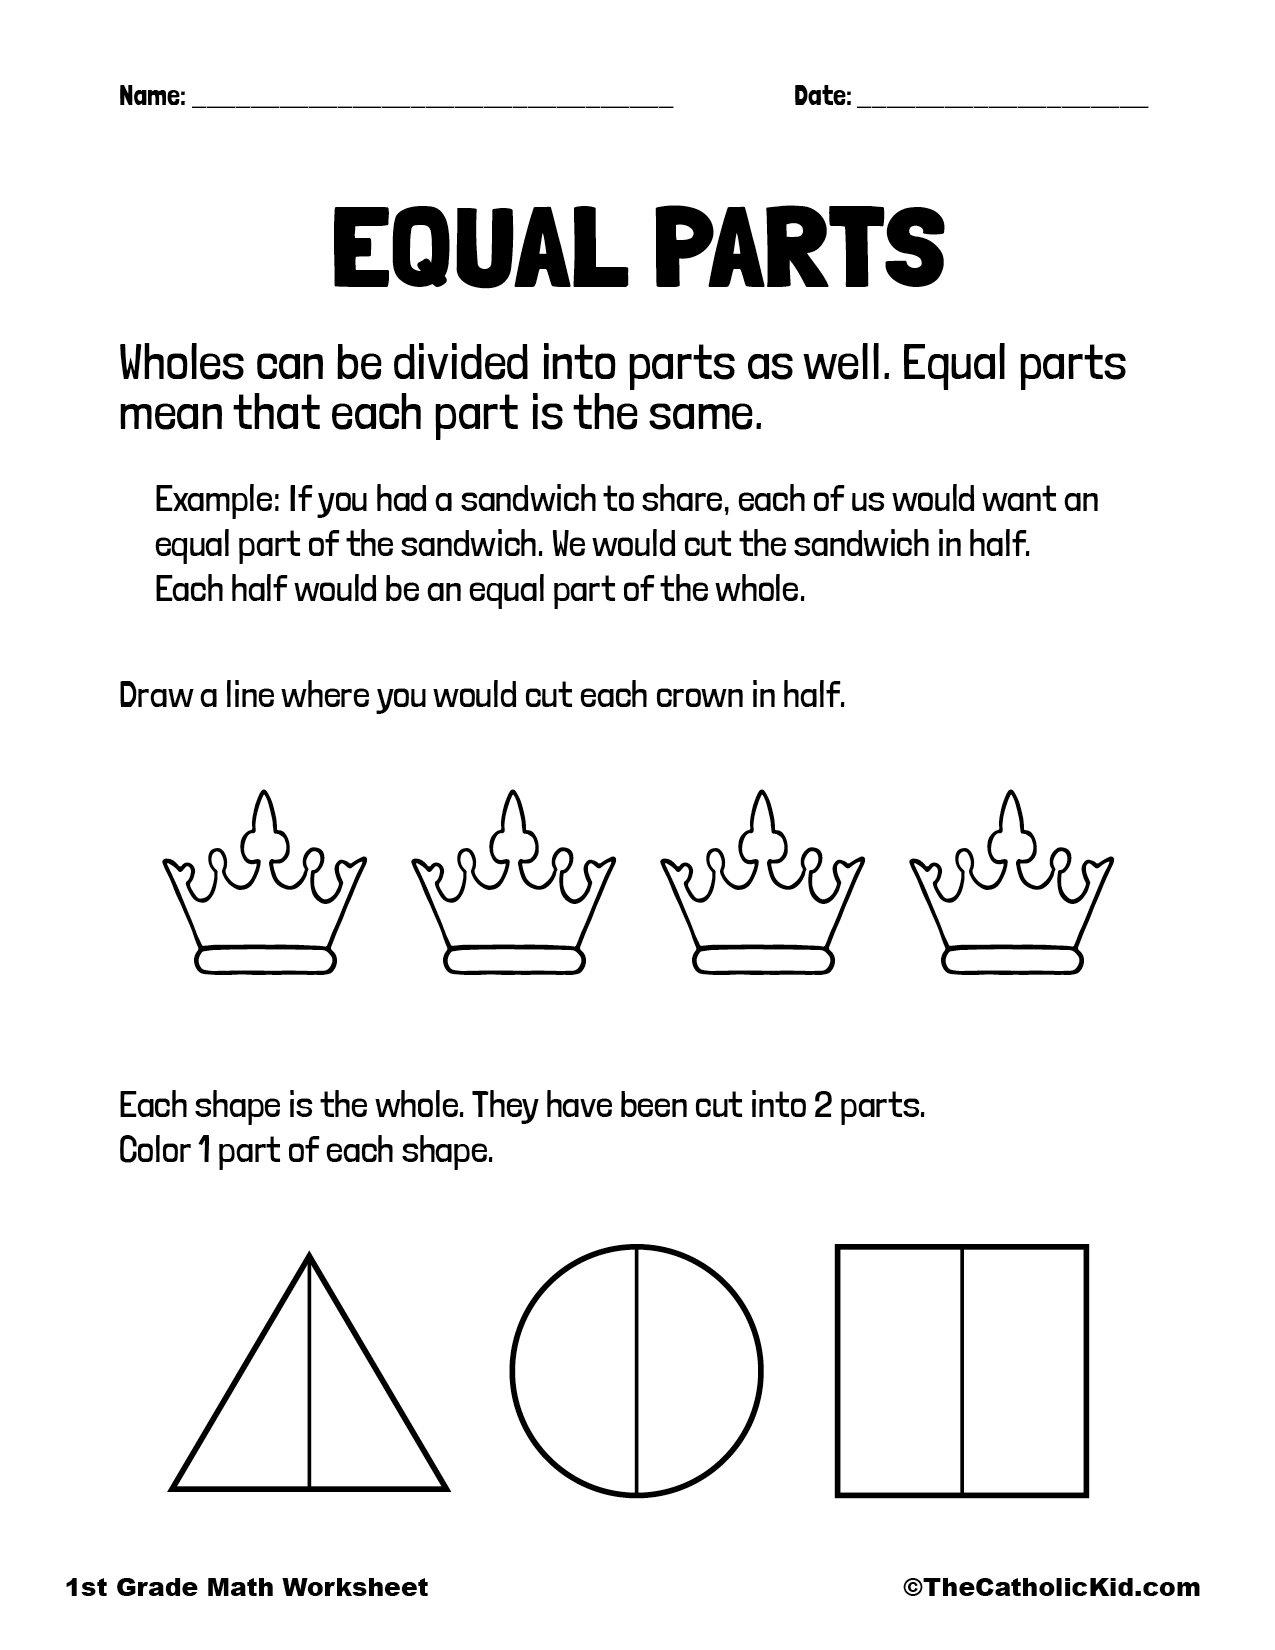 Equal Parts Fractions - 1st Grade Math Worksheet Catholic